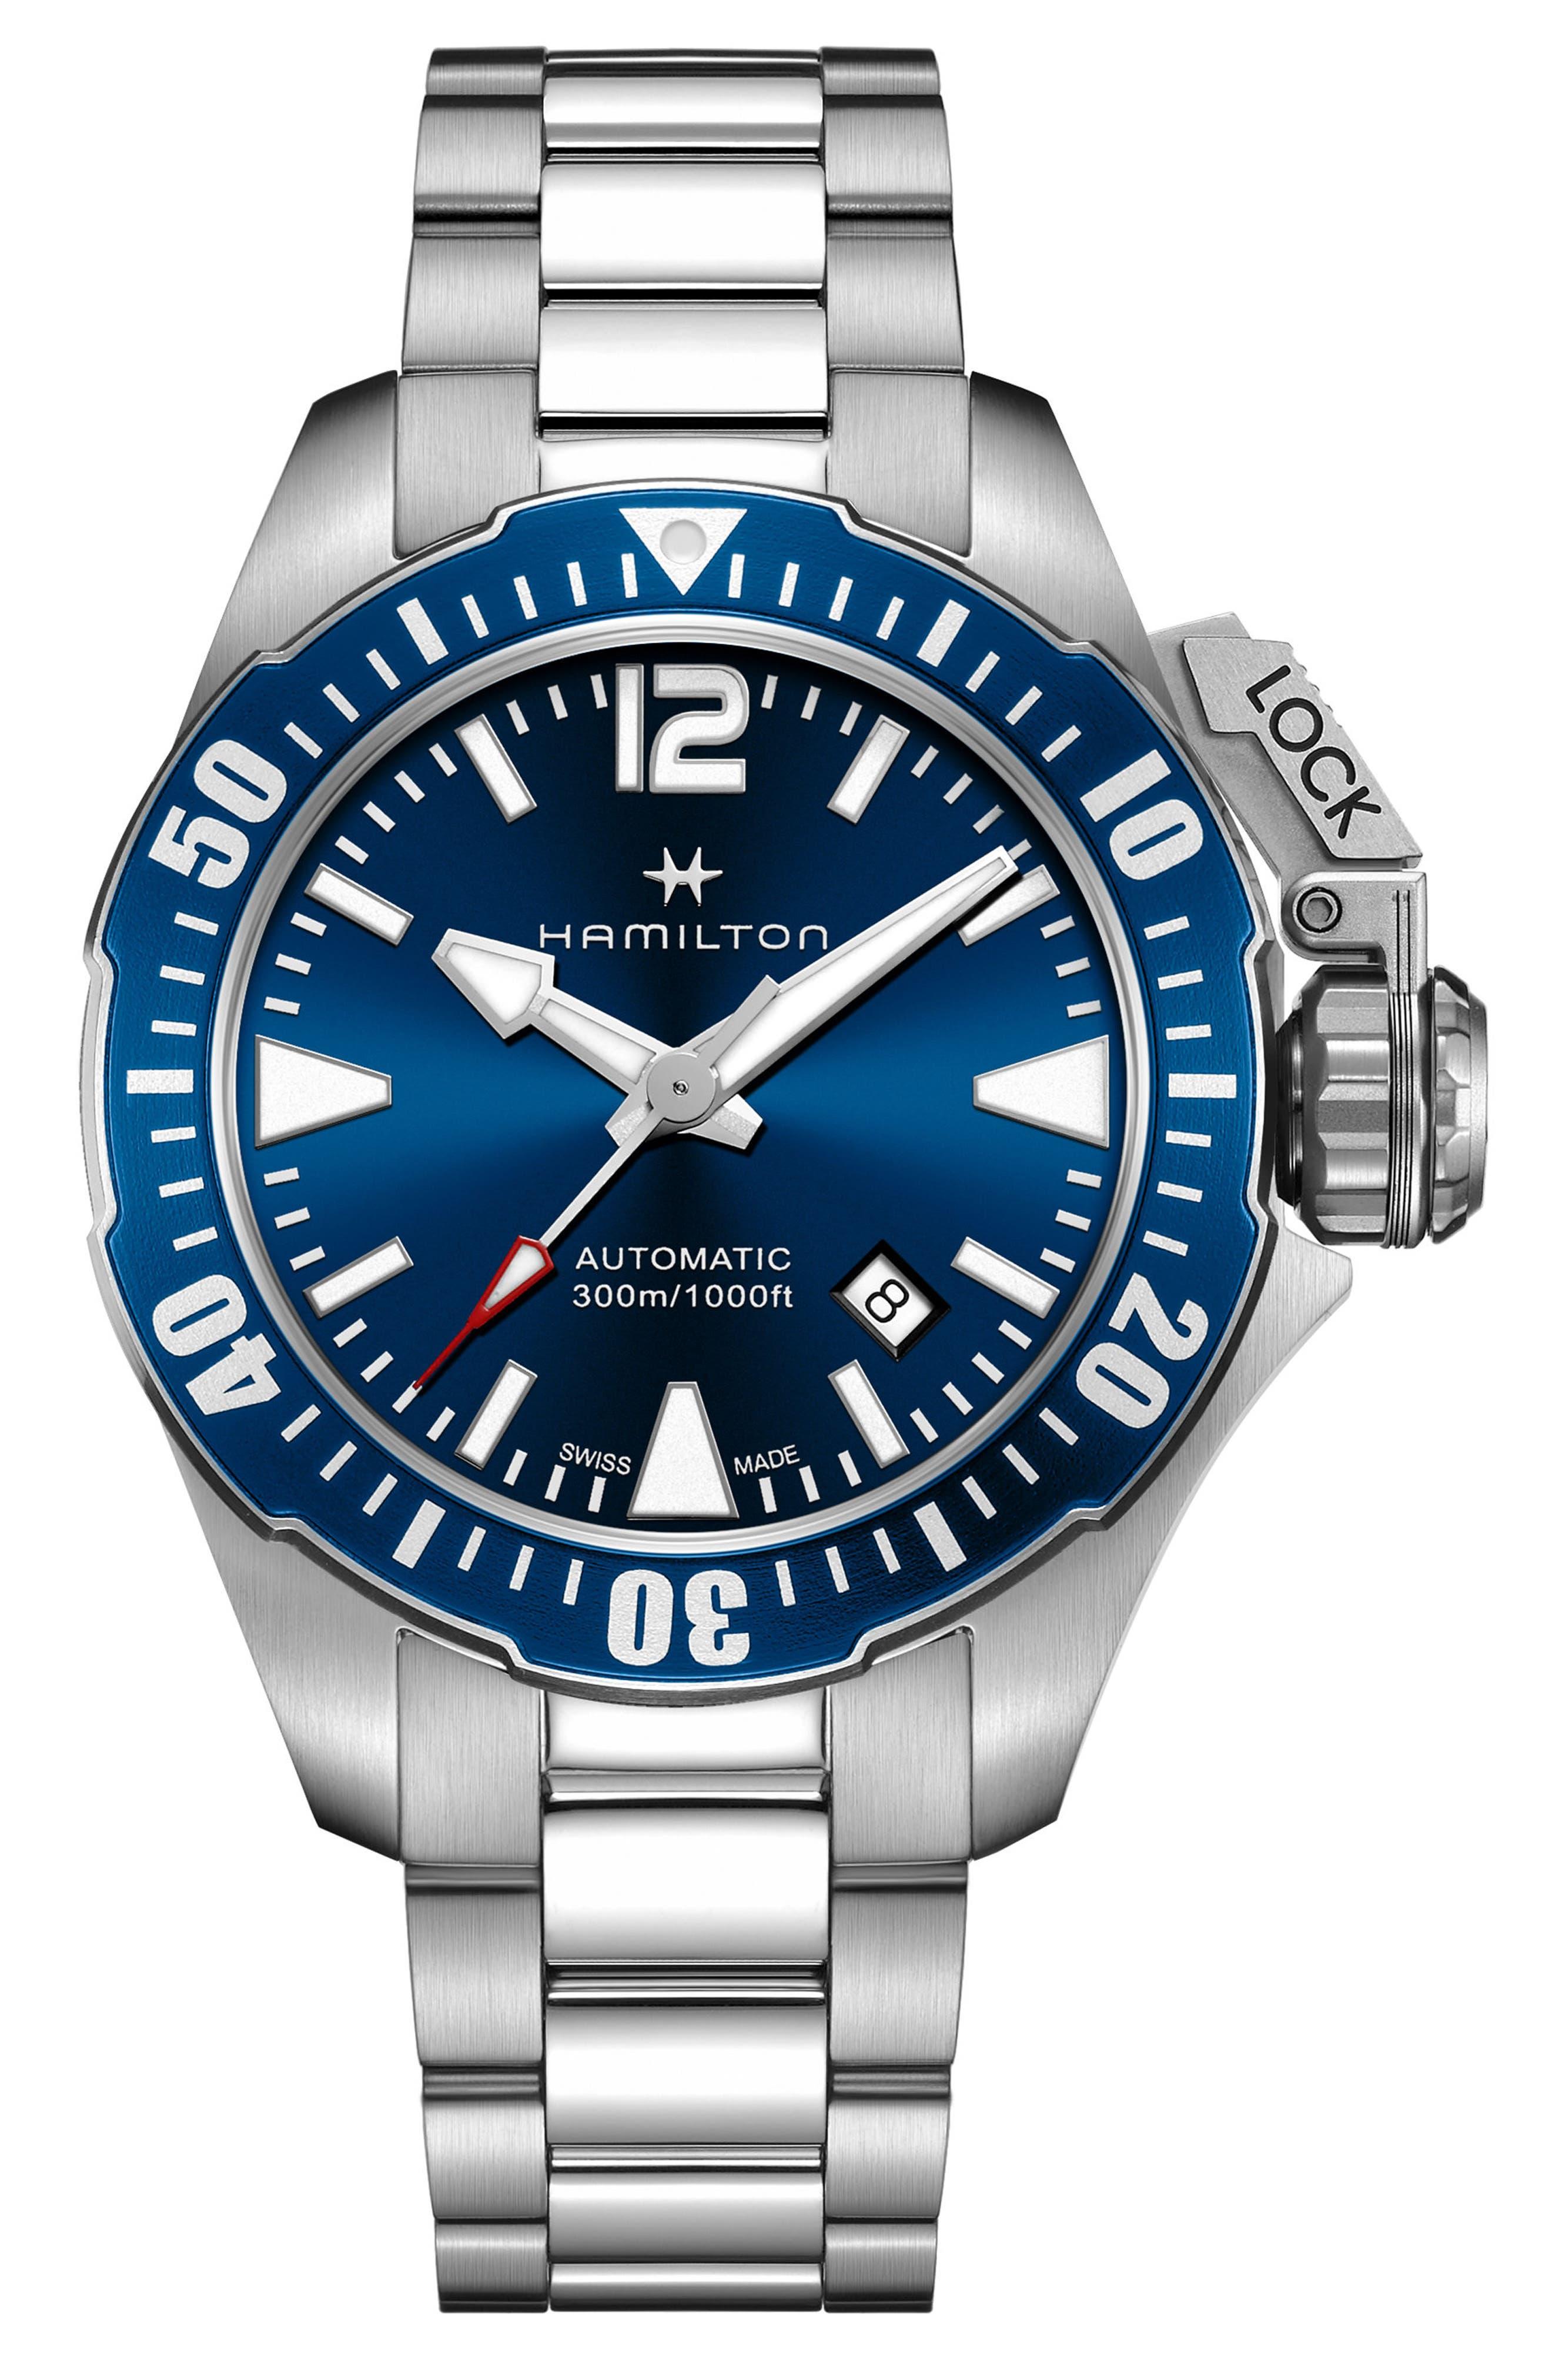 HAMILTON Khaki Navy Frogman Automatic Bracelet Watch, 42mm, Main, color, SILVER/ BLUE/ SILVER